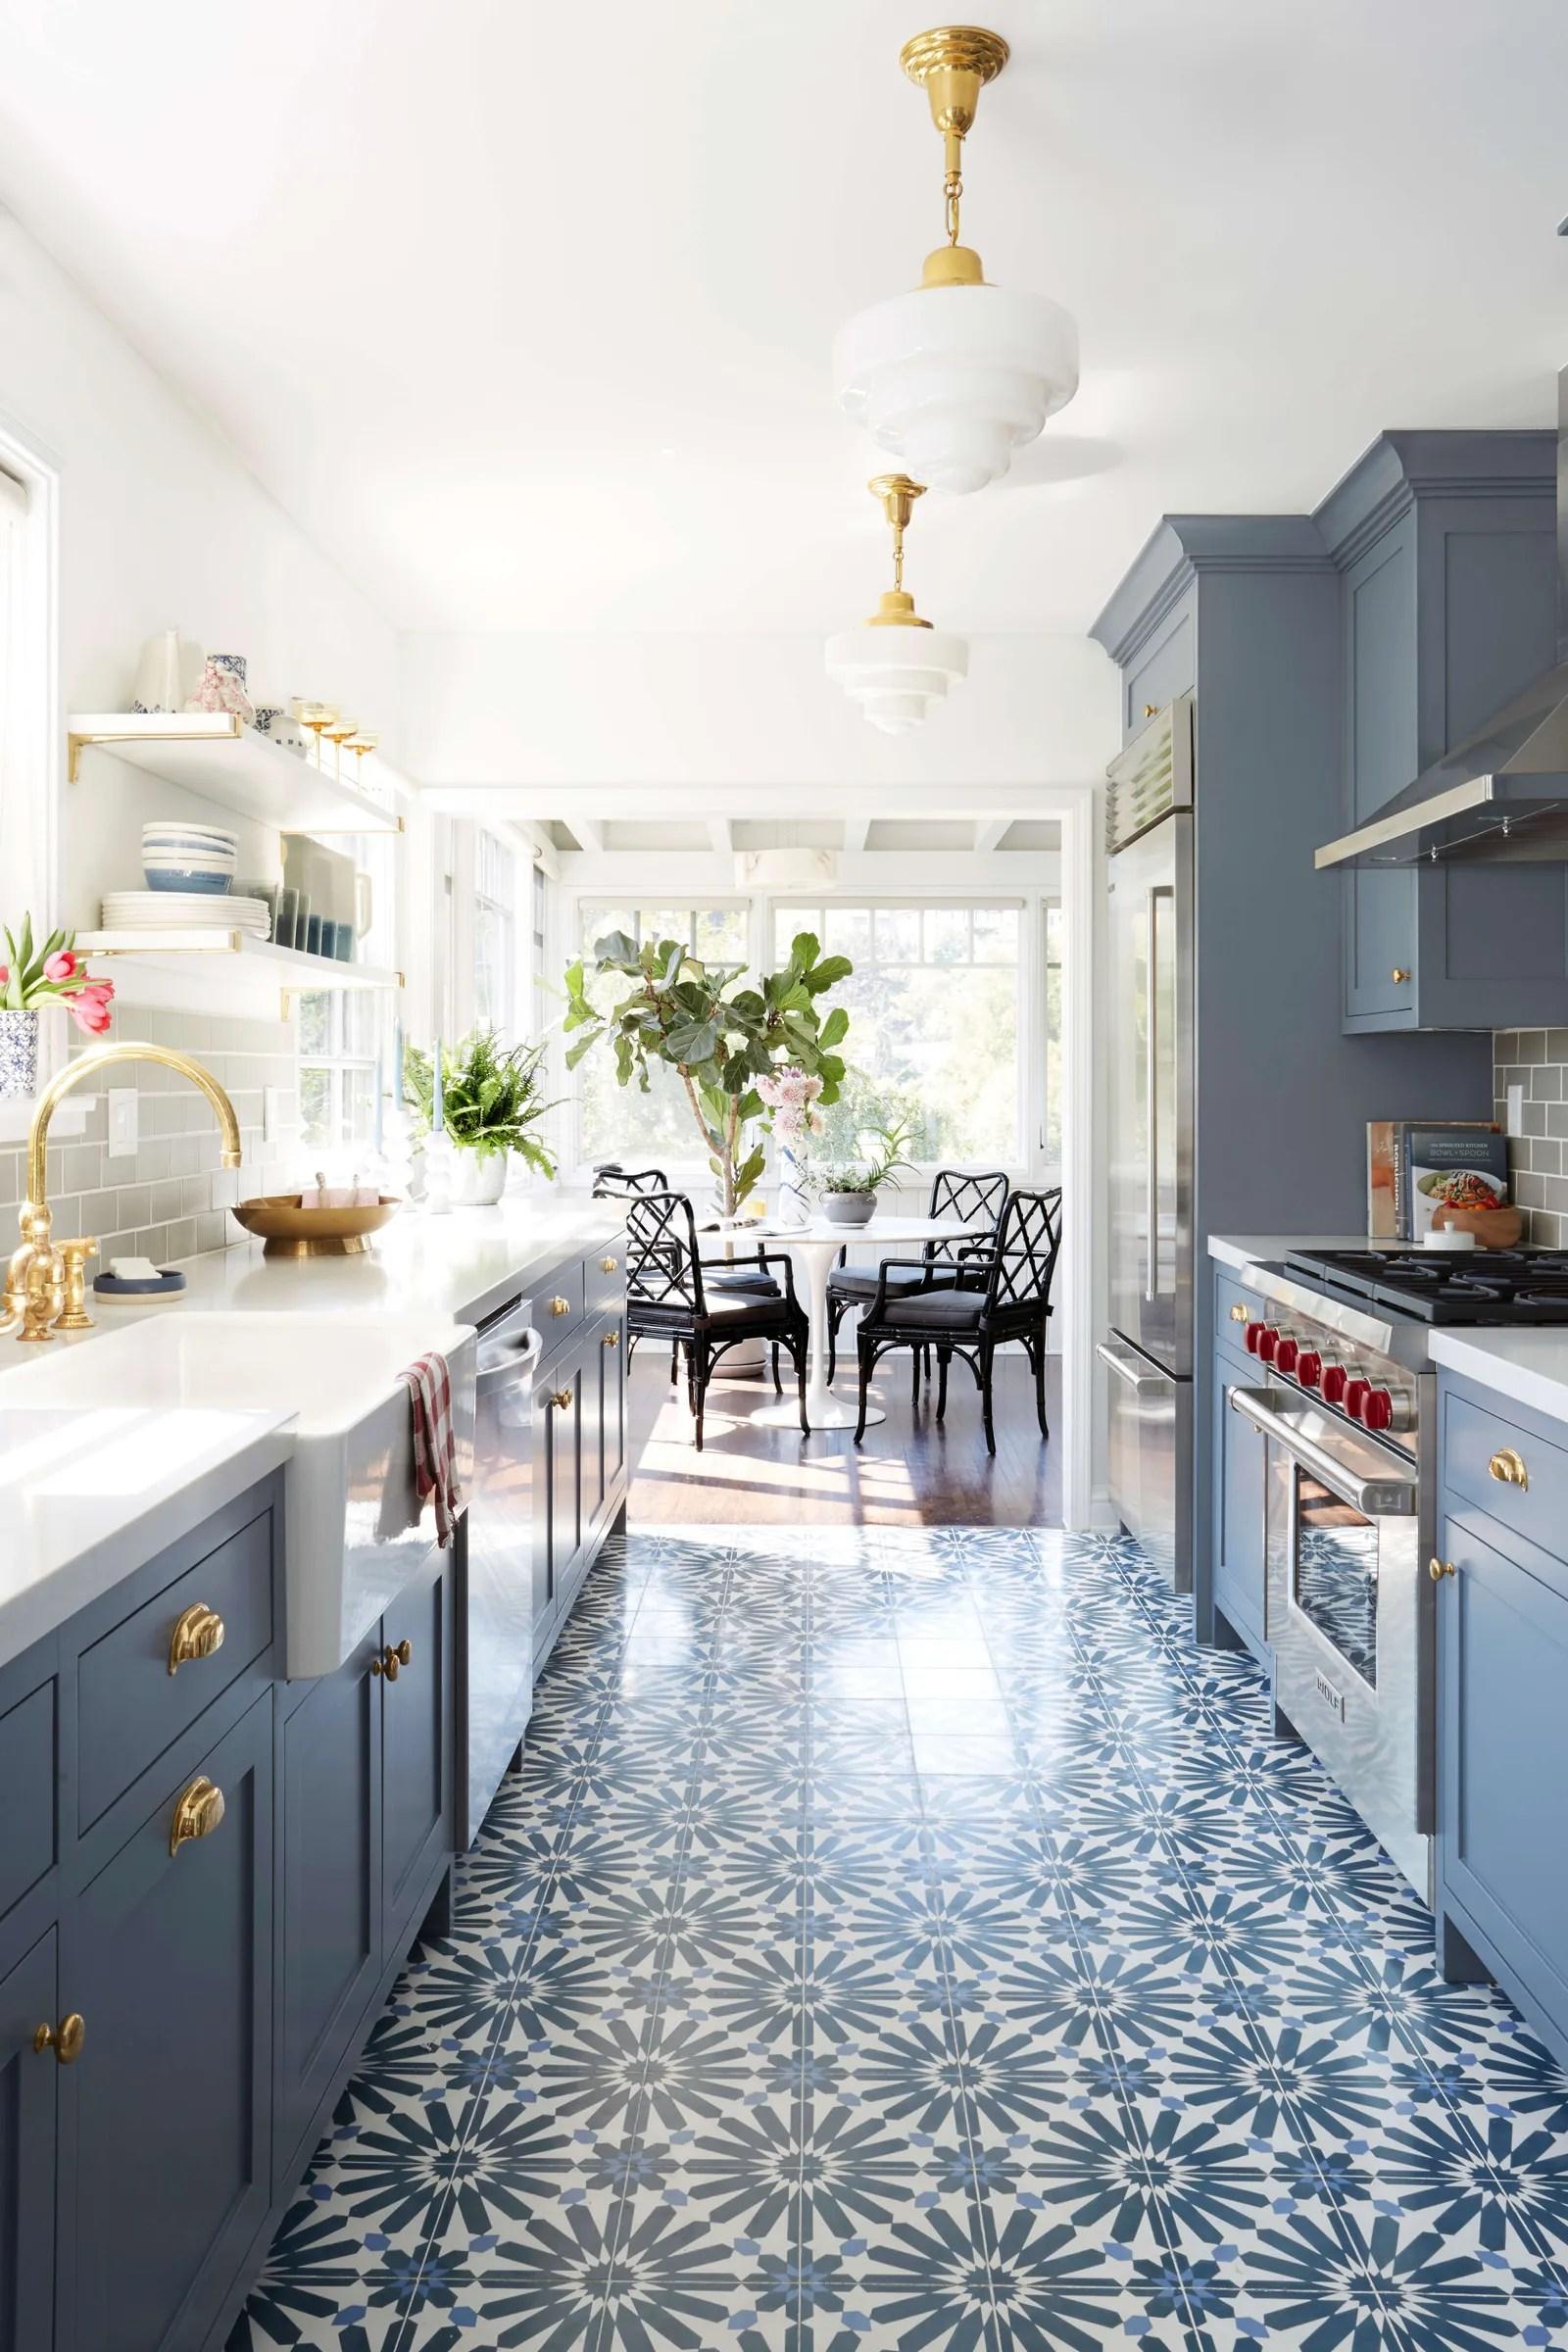 Small Galley Kitchen Ideas & Design Inspiration ... on Small Kitchen Ideas  id=35492